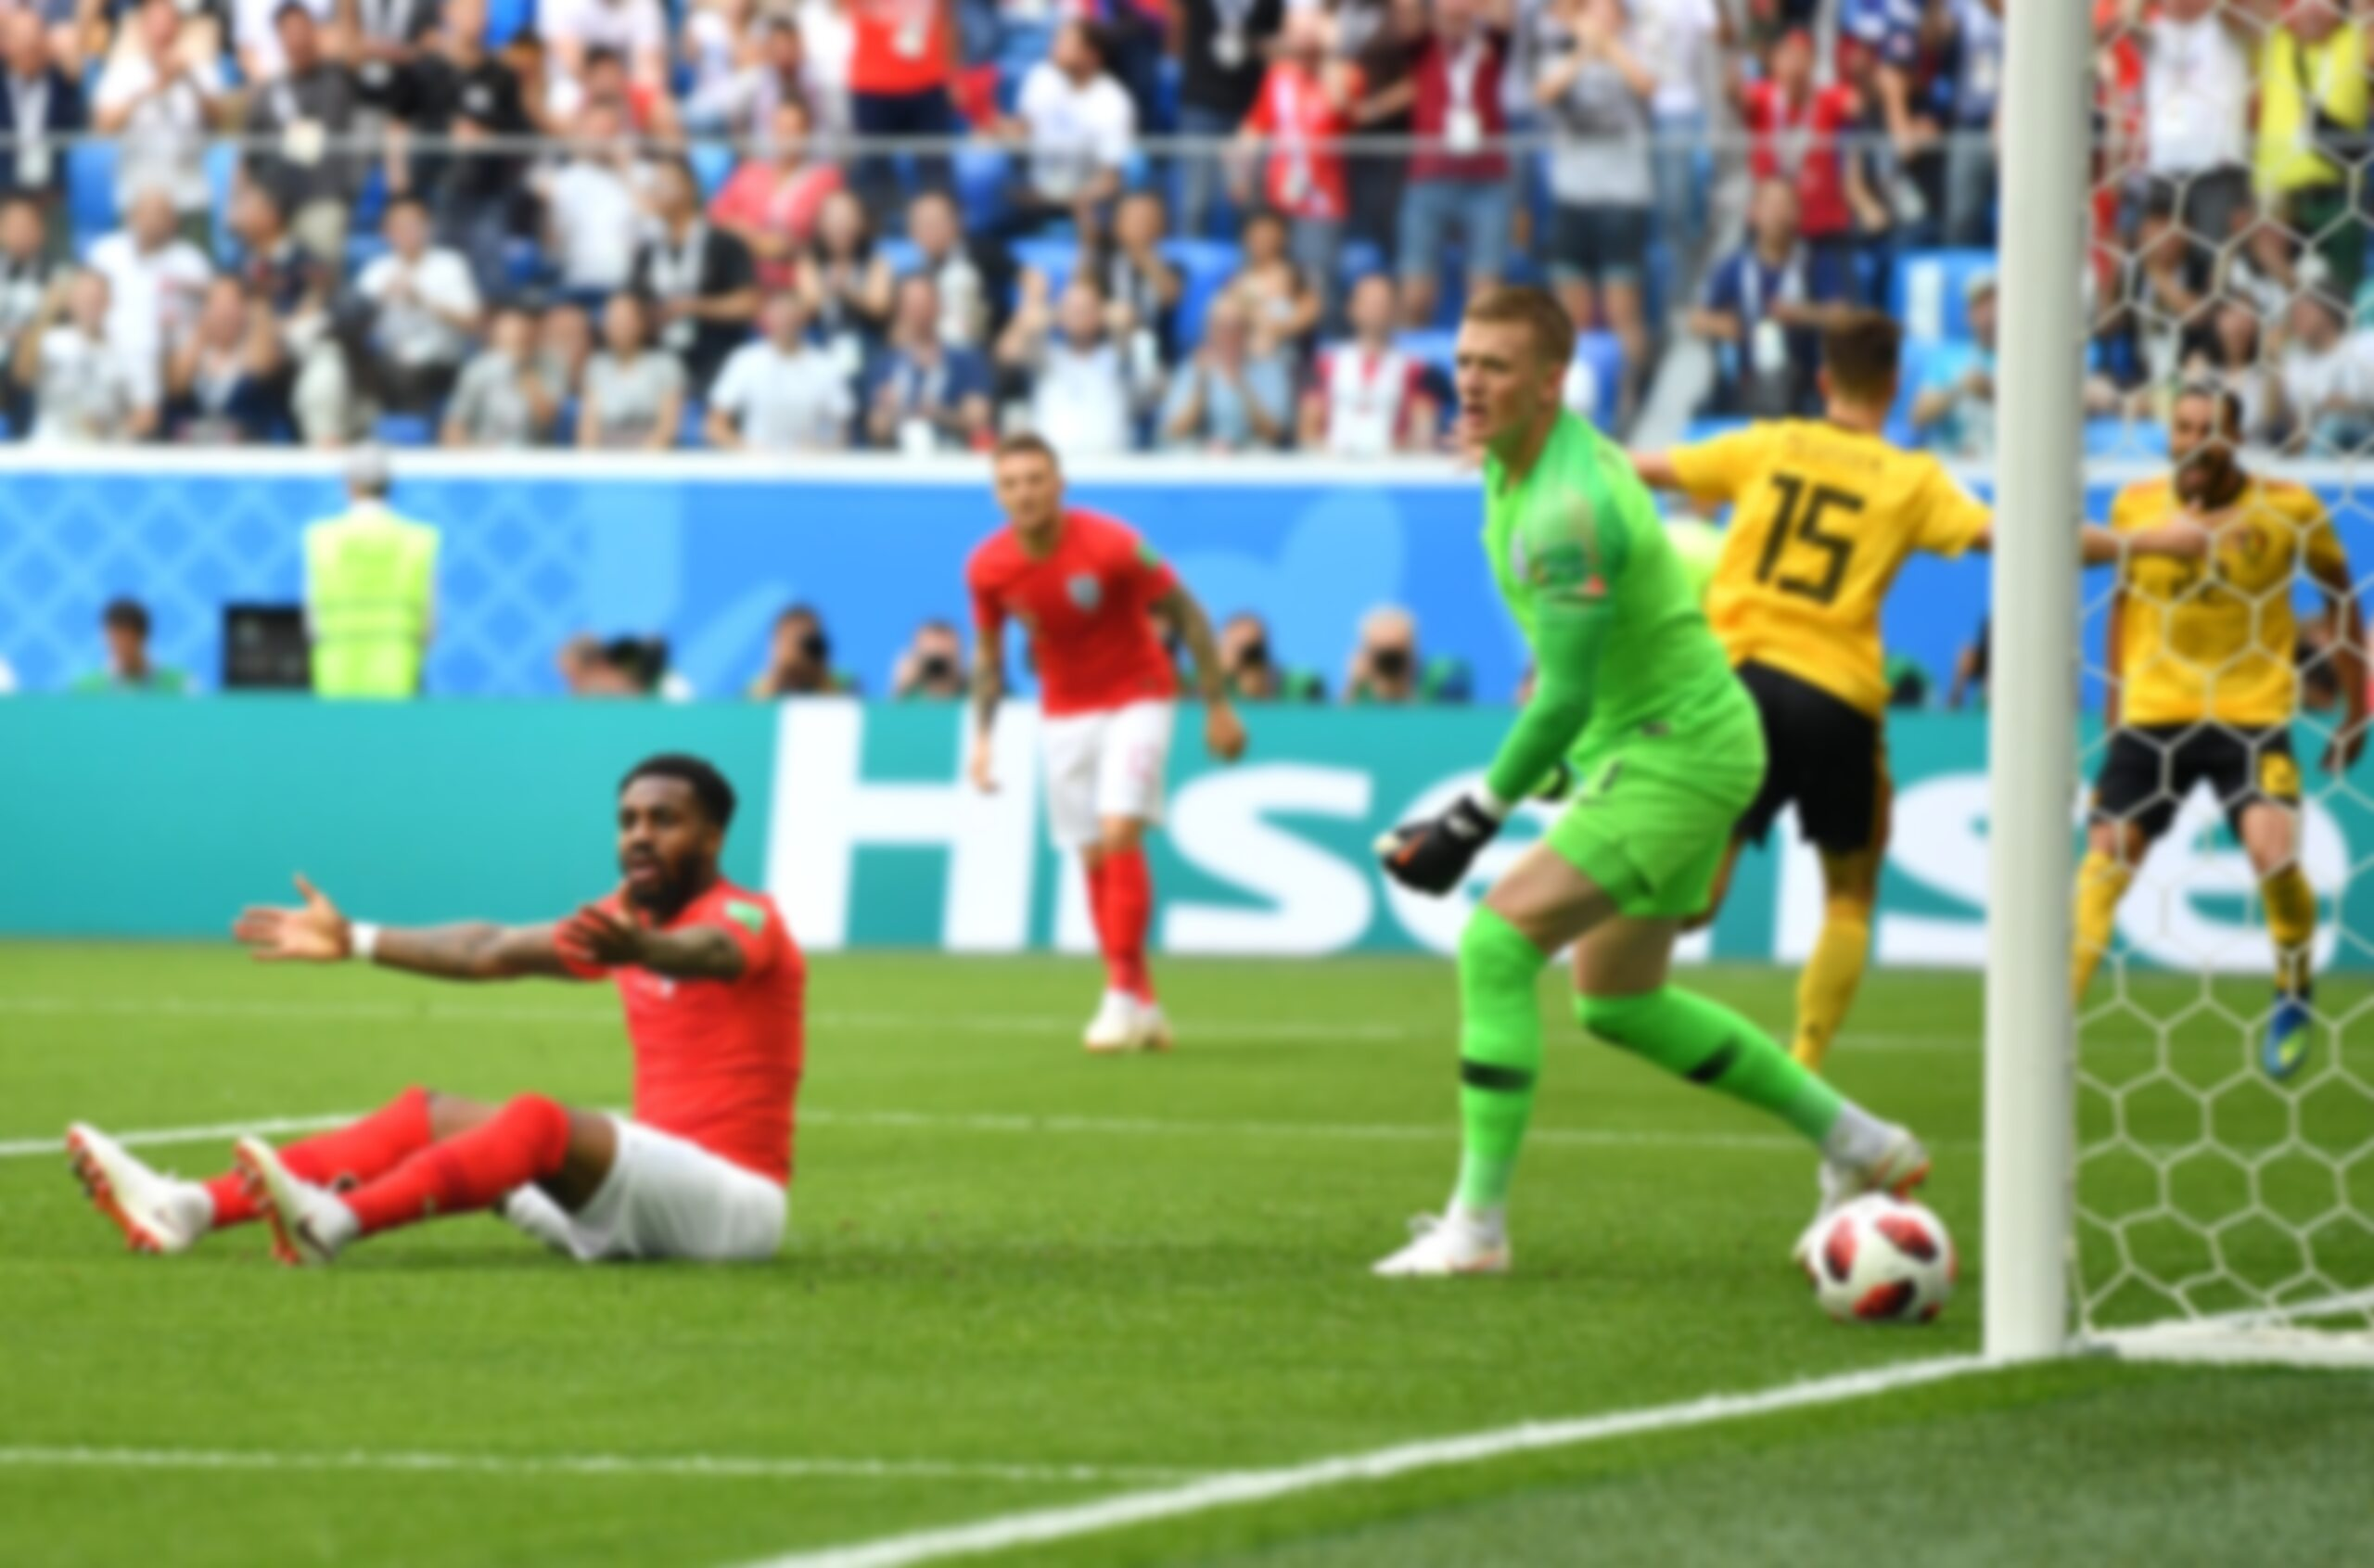 Mecz Belgia - Anglia